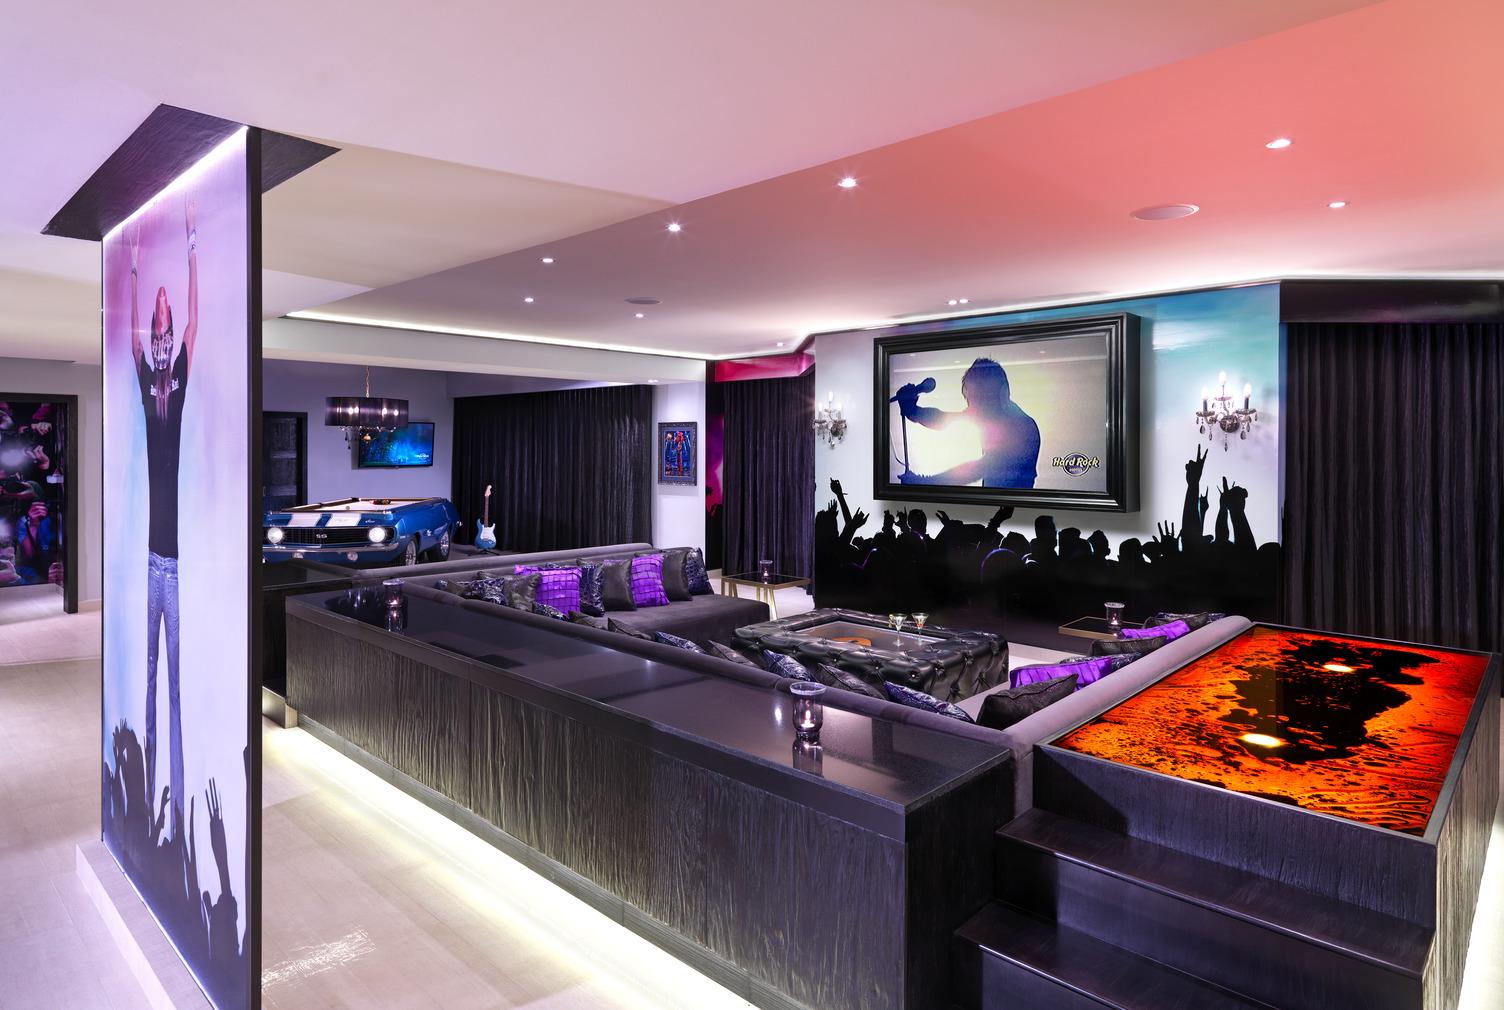 Travel Agency All-Inclusive Resort Heaven at Hard Rock Hotel Riviera Maya 27